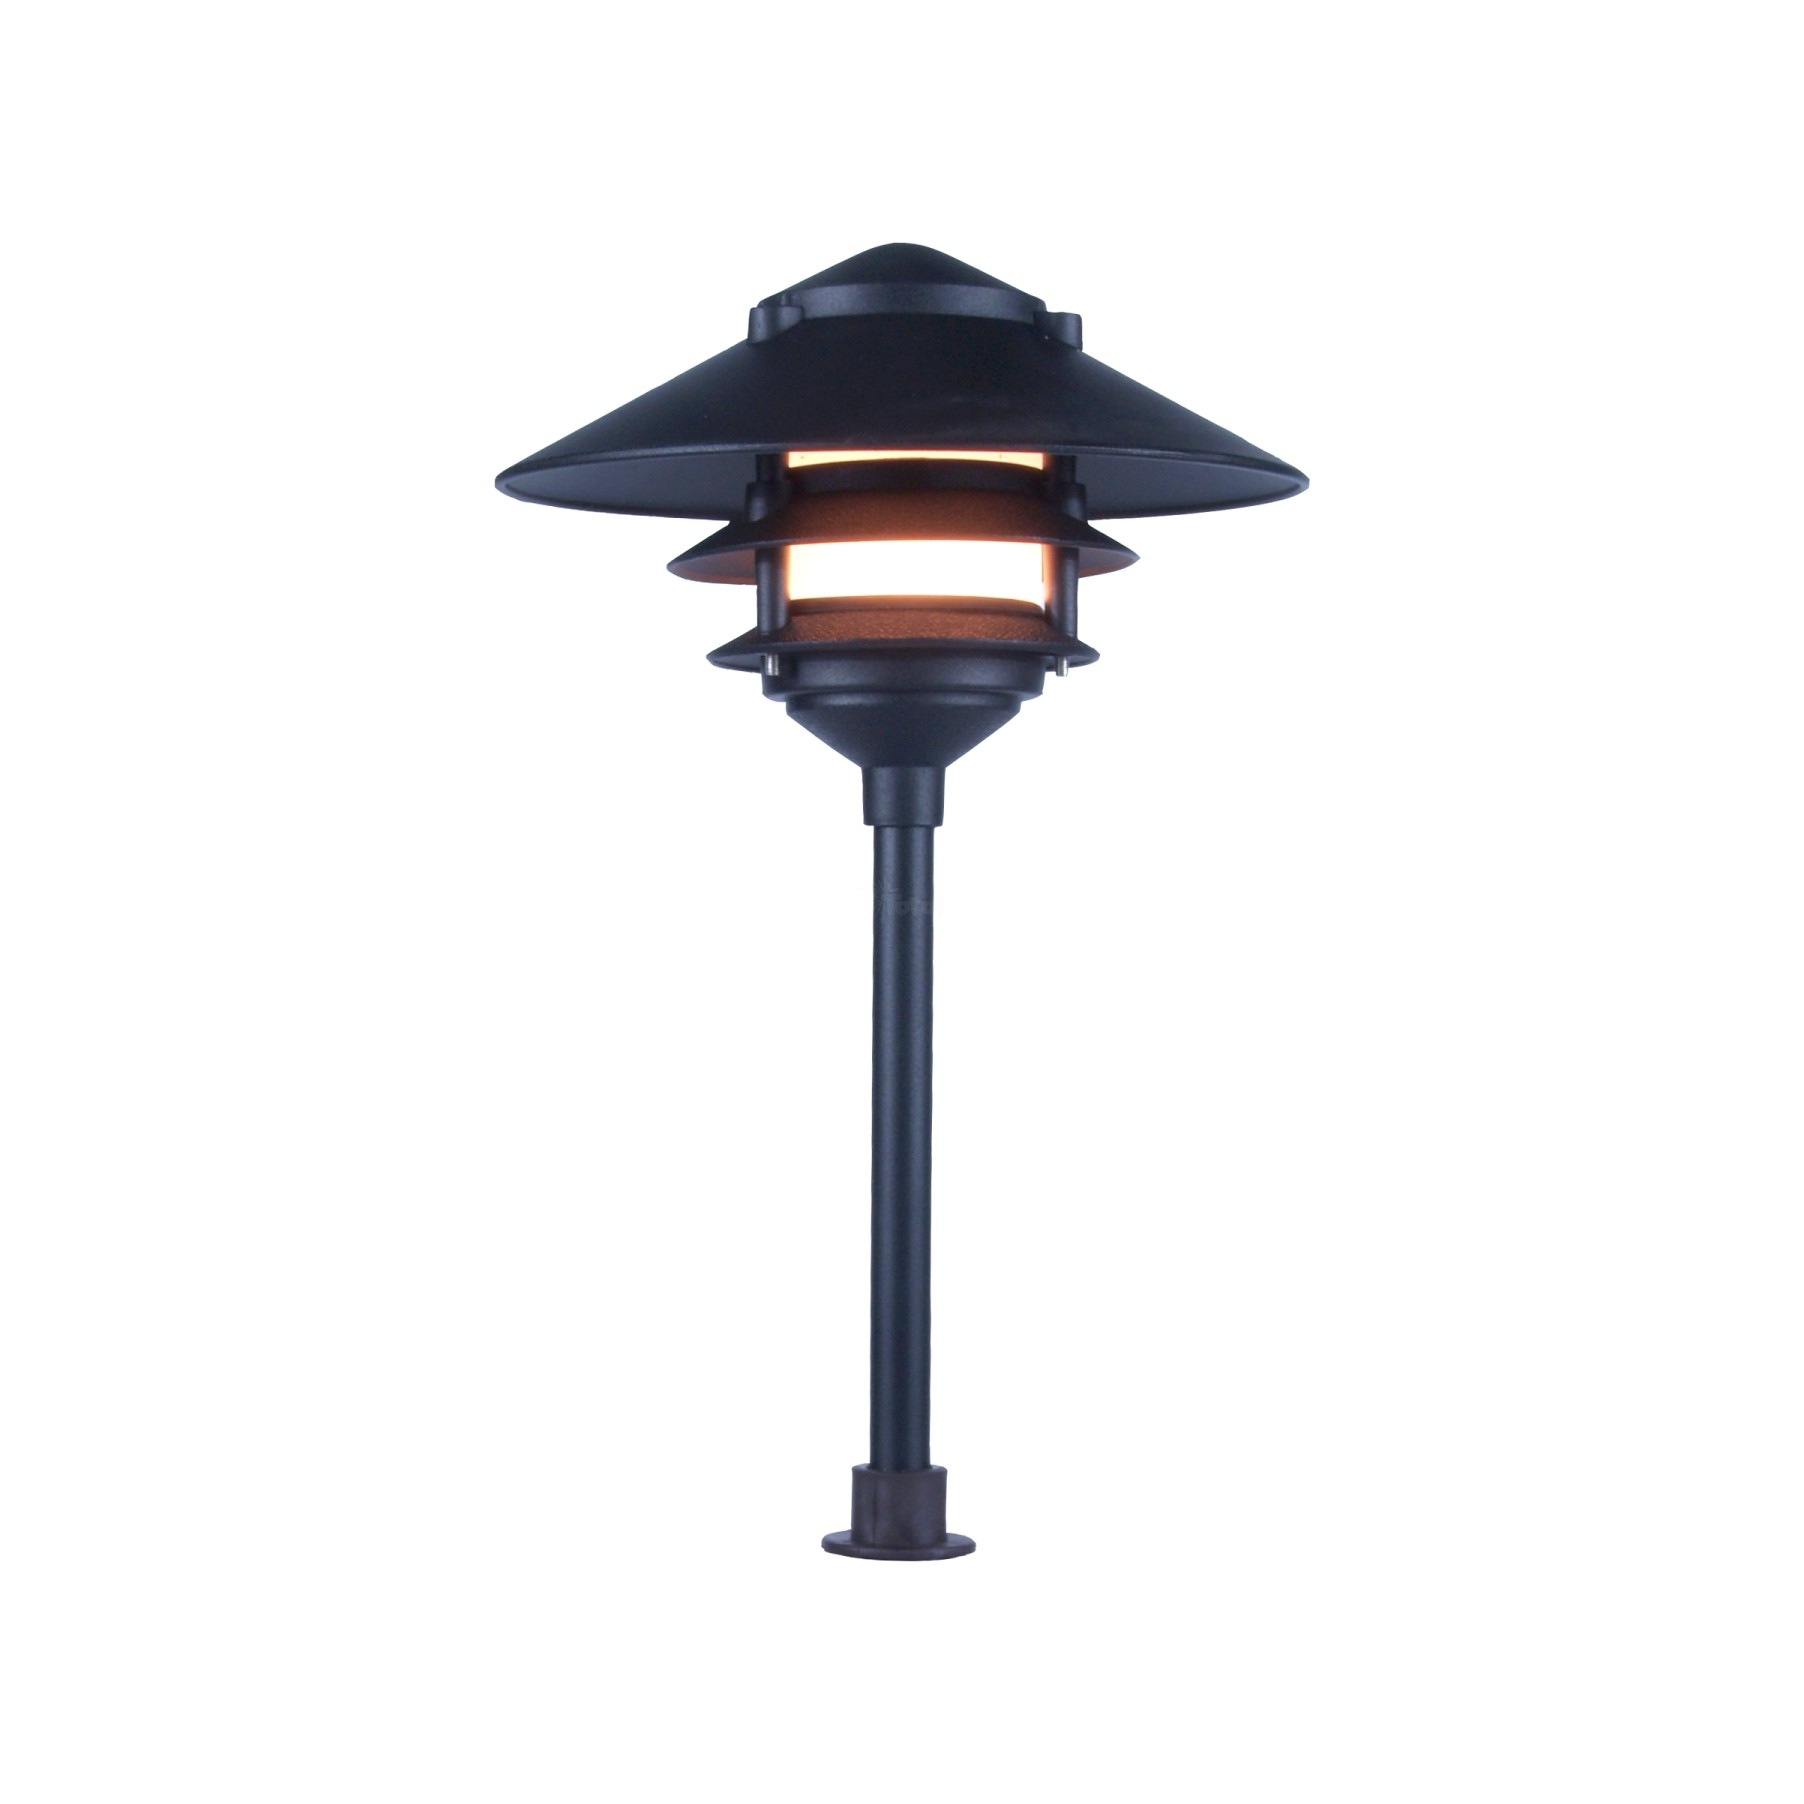 Landscape lighting low voltage clear lens wide brim pagoda path light